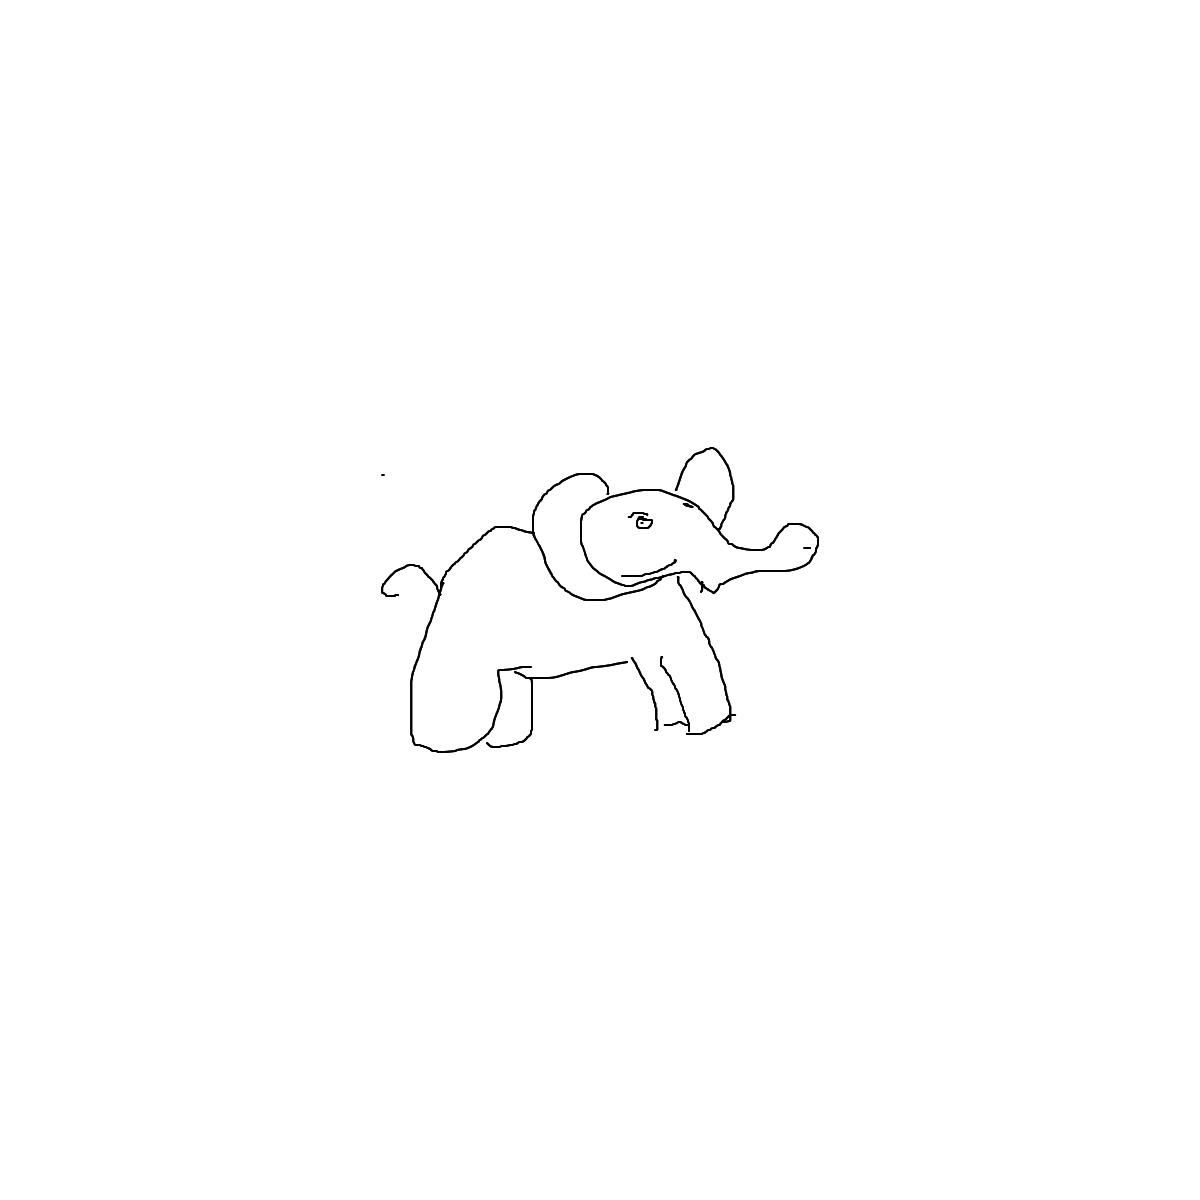 BAAAM drawing#1173 lat:51.6774101257324200lng: 14.3307104110717770